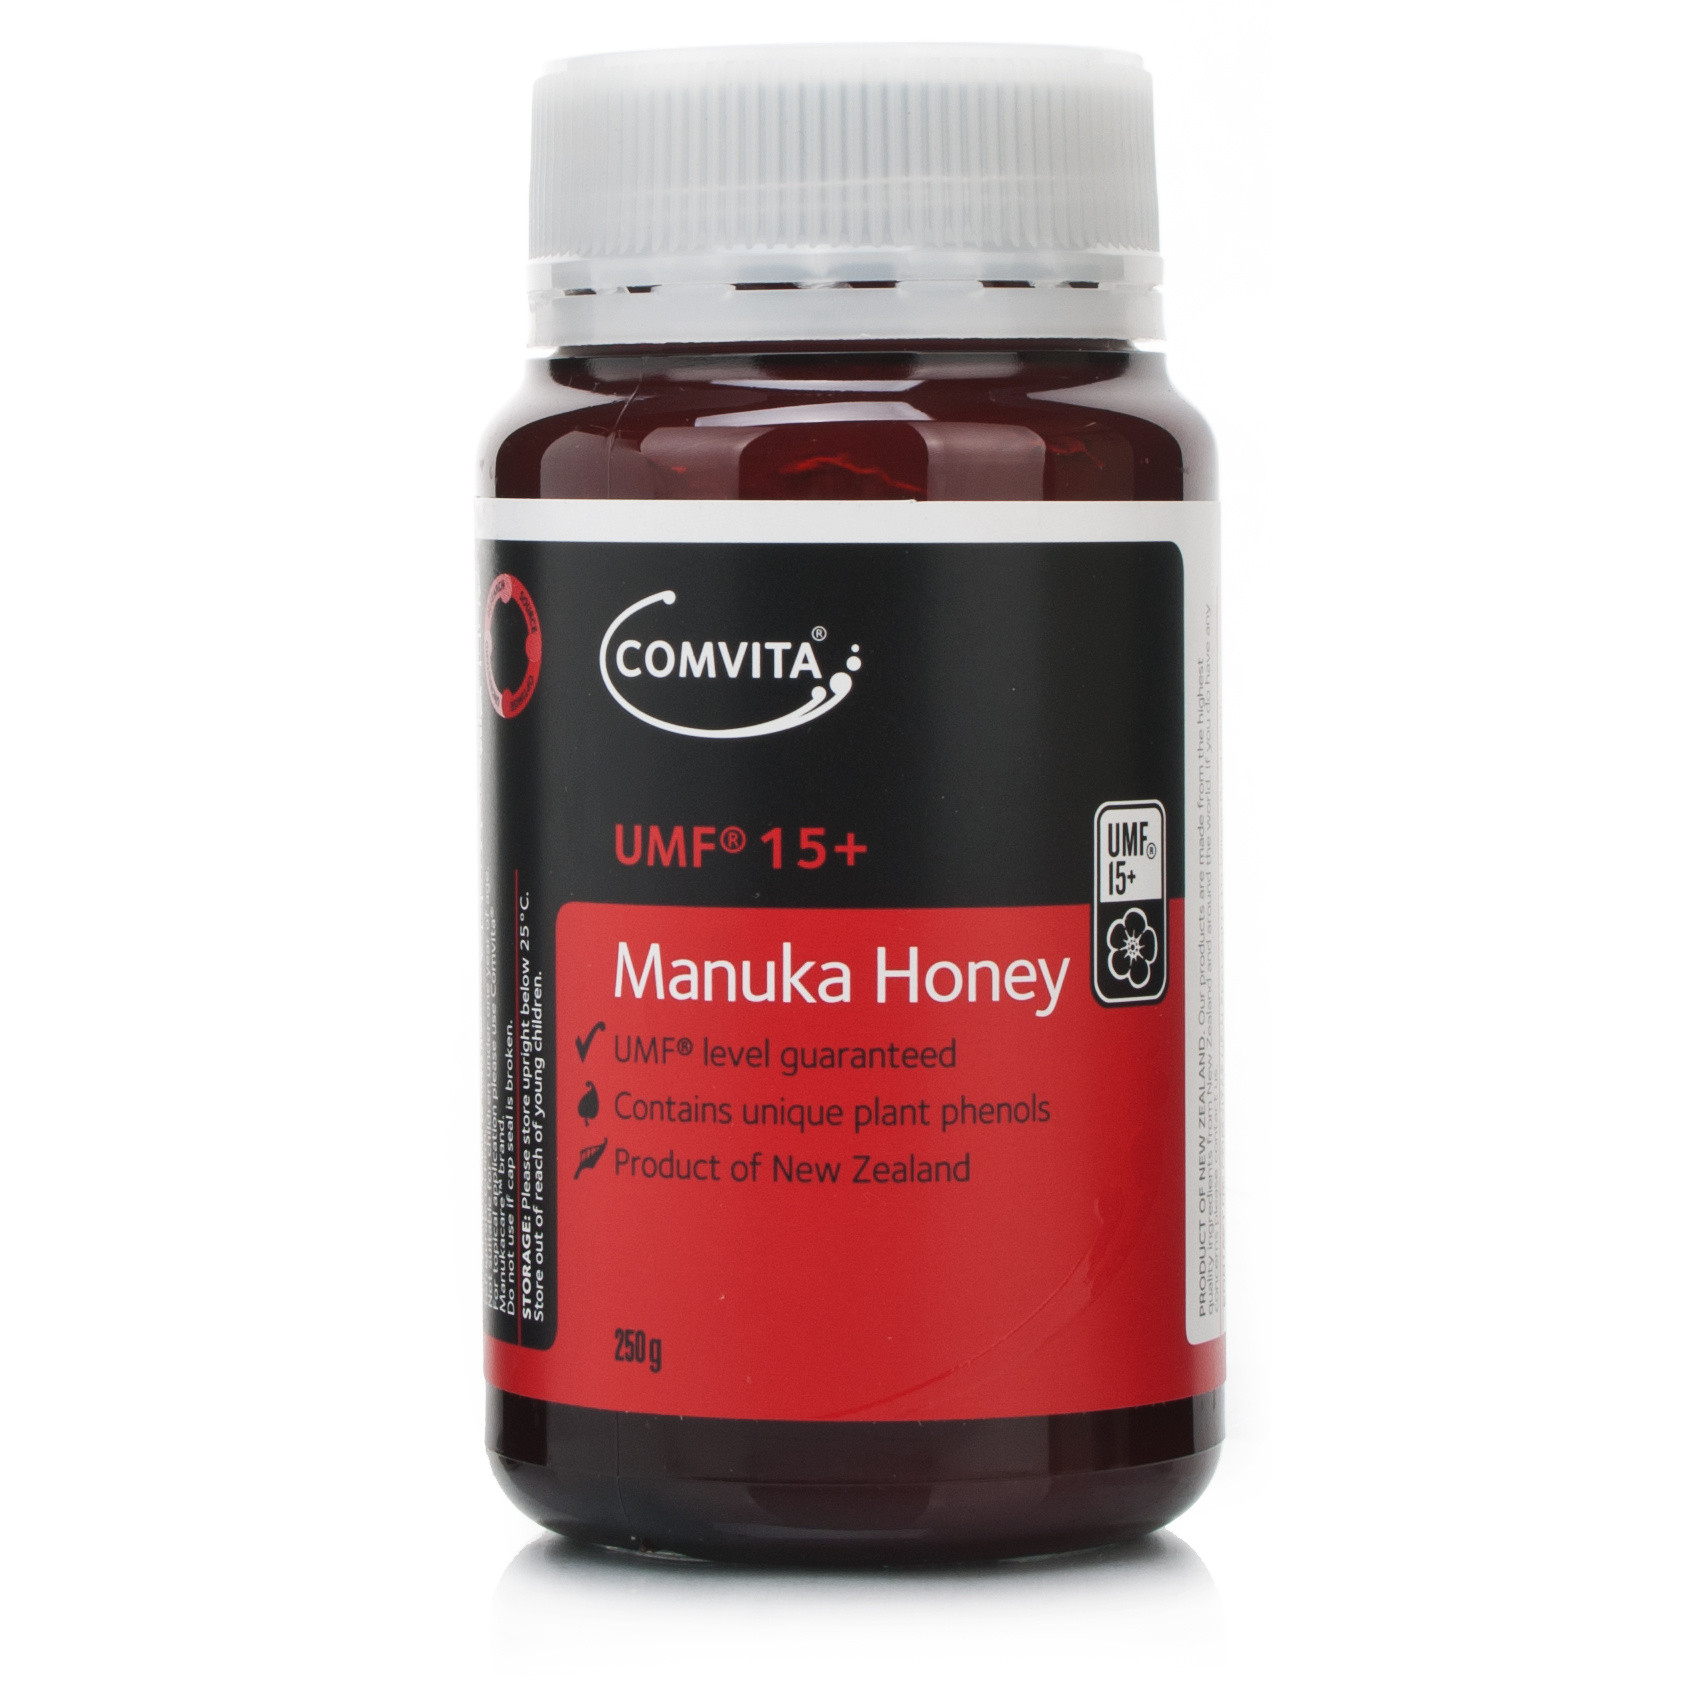 Comvita honey active manuka honey umf 15 chemist direct - Benefits of manuka honey the natural antibiotic ...